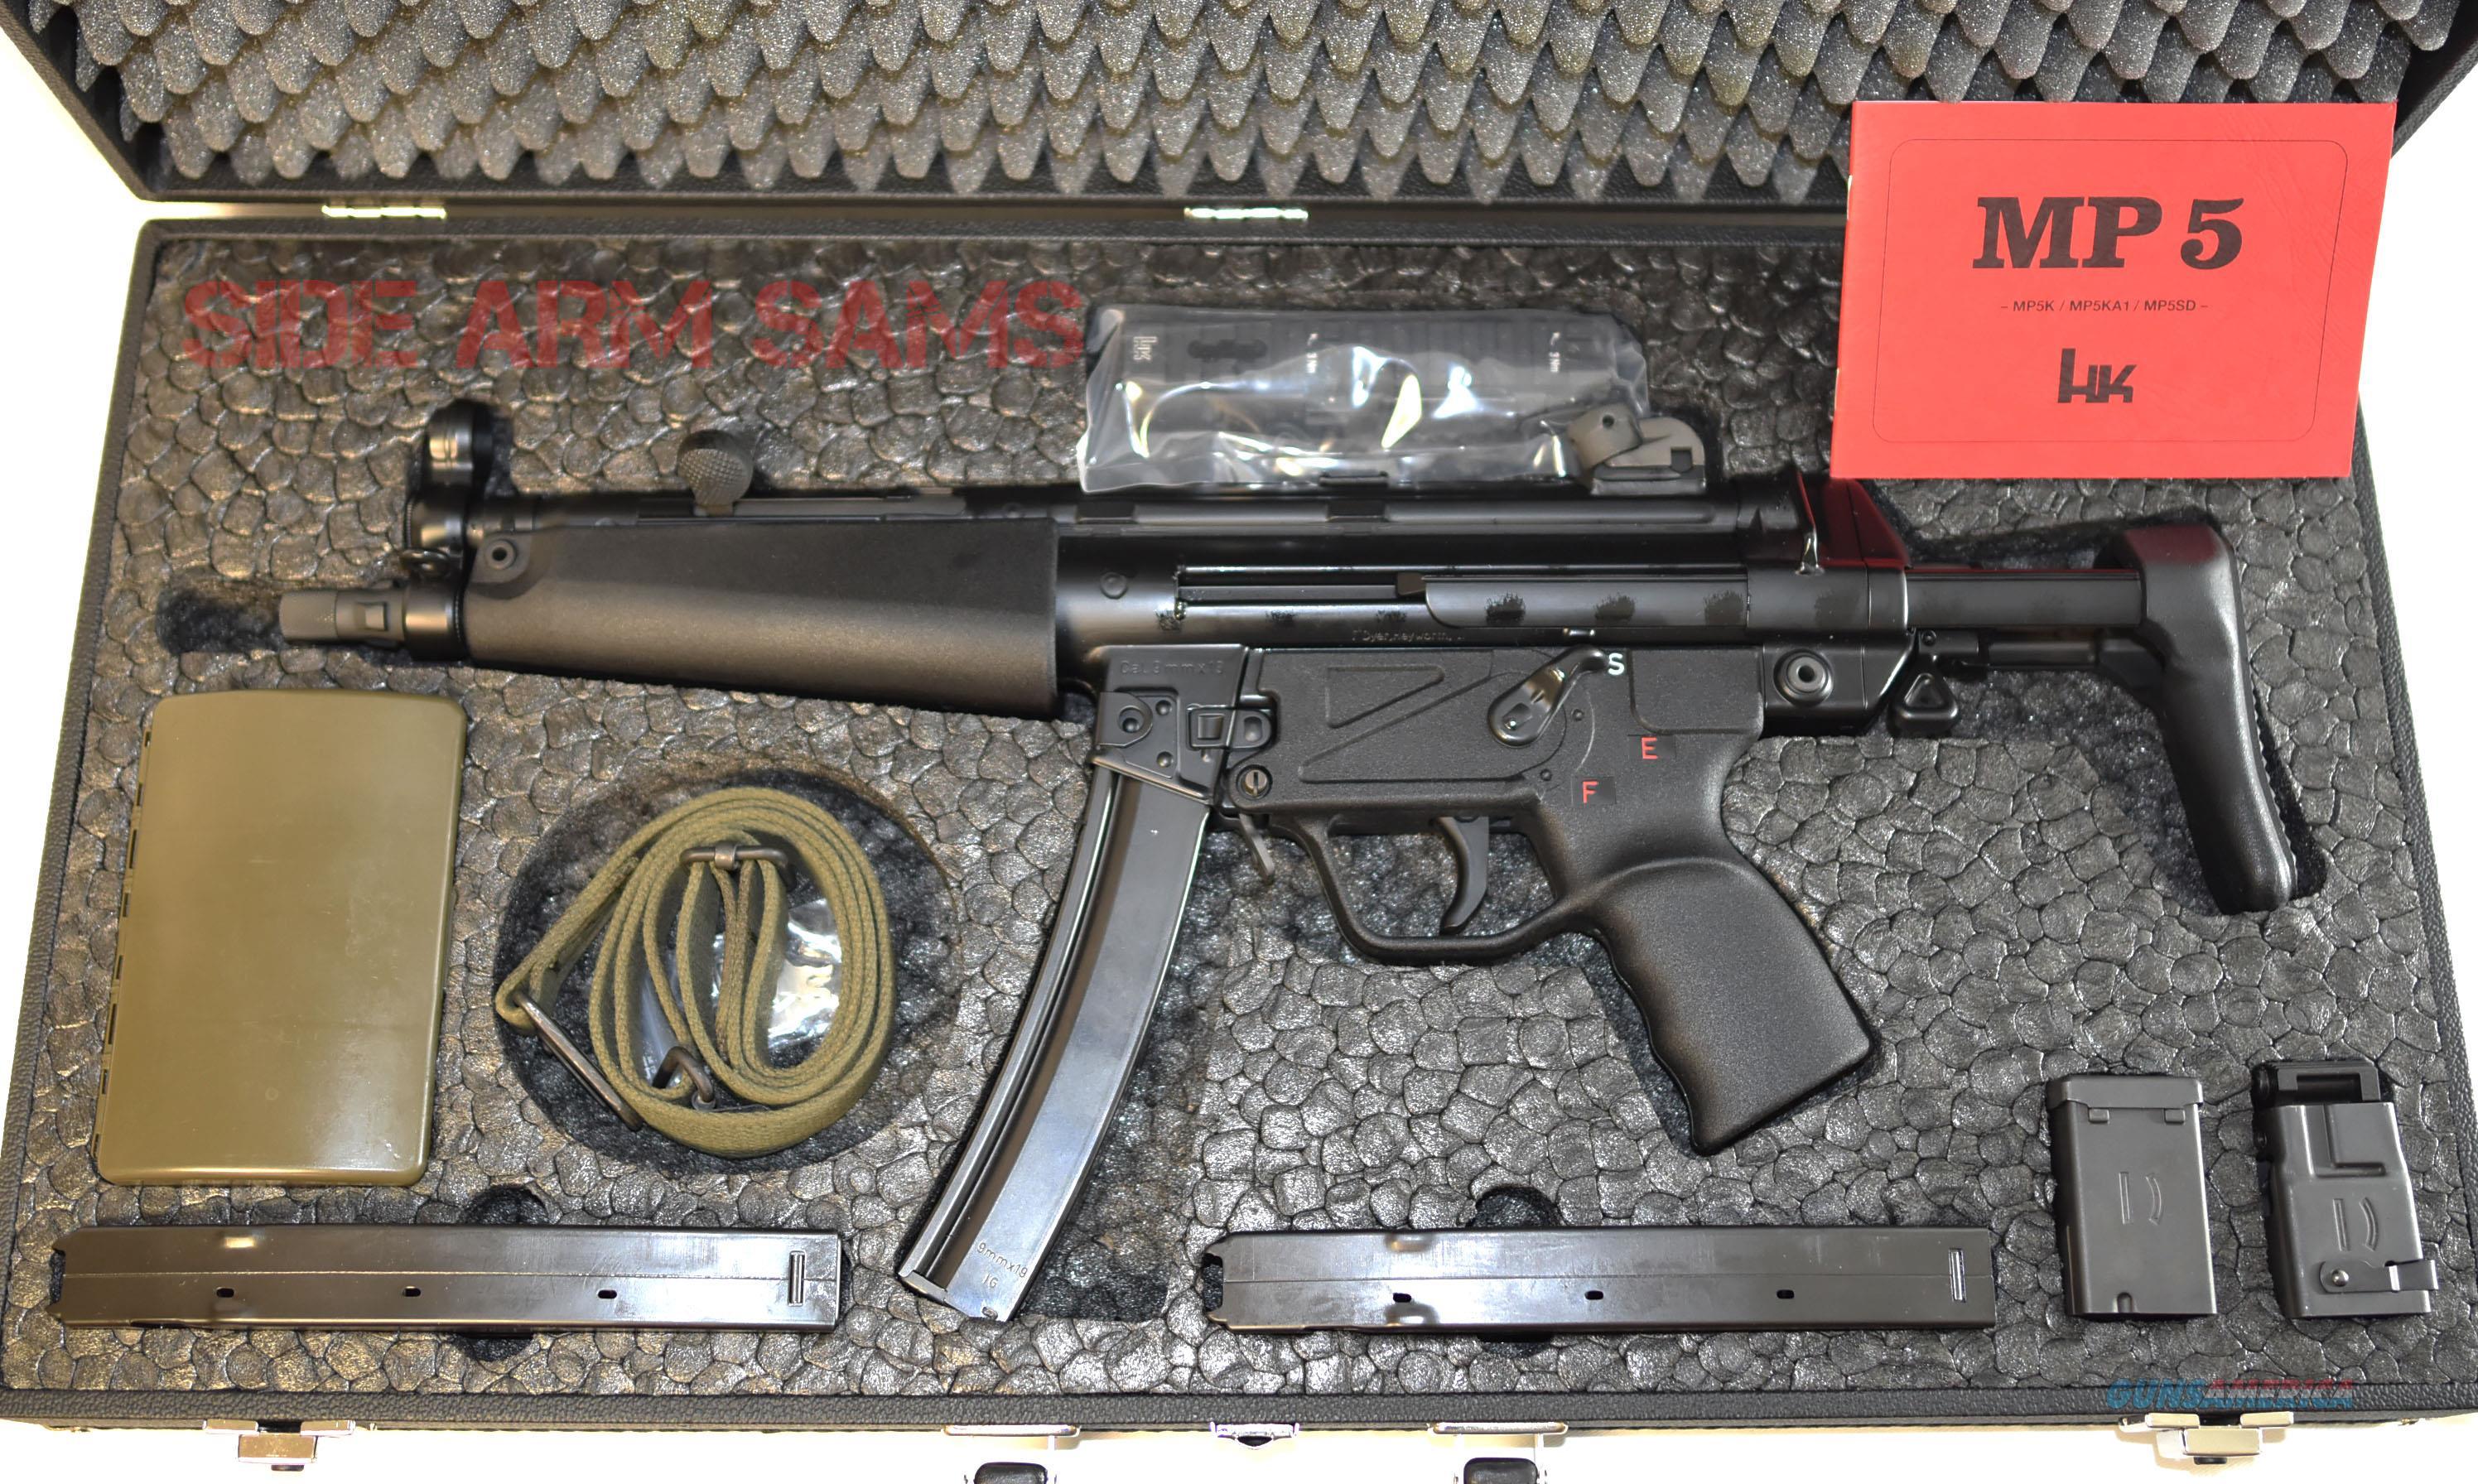 Unfired HK-MP5-N,Qualified Sear/TDyer, German Attache, Awesome Package  Guns > Rifles > Class 3 Rifles > Class 3 Subguns